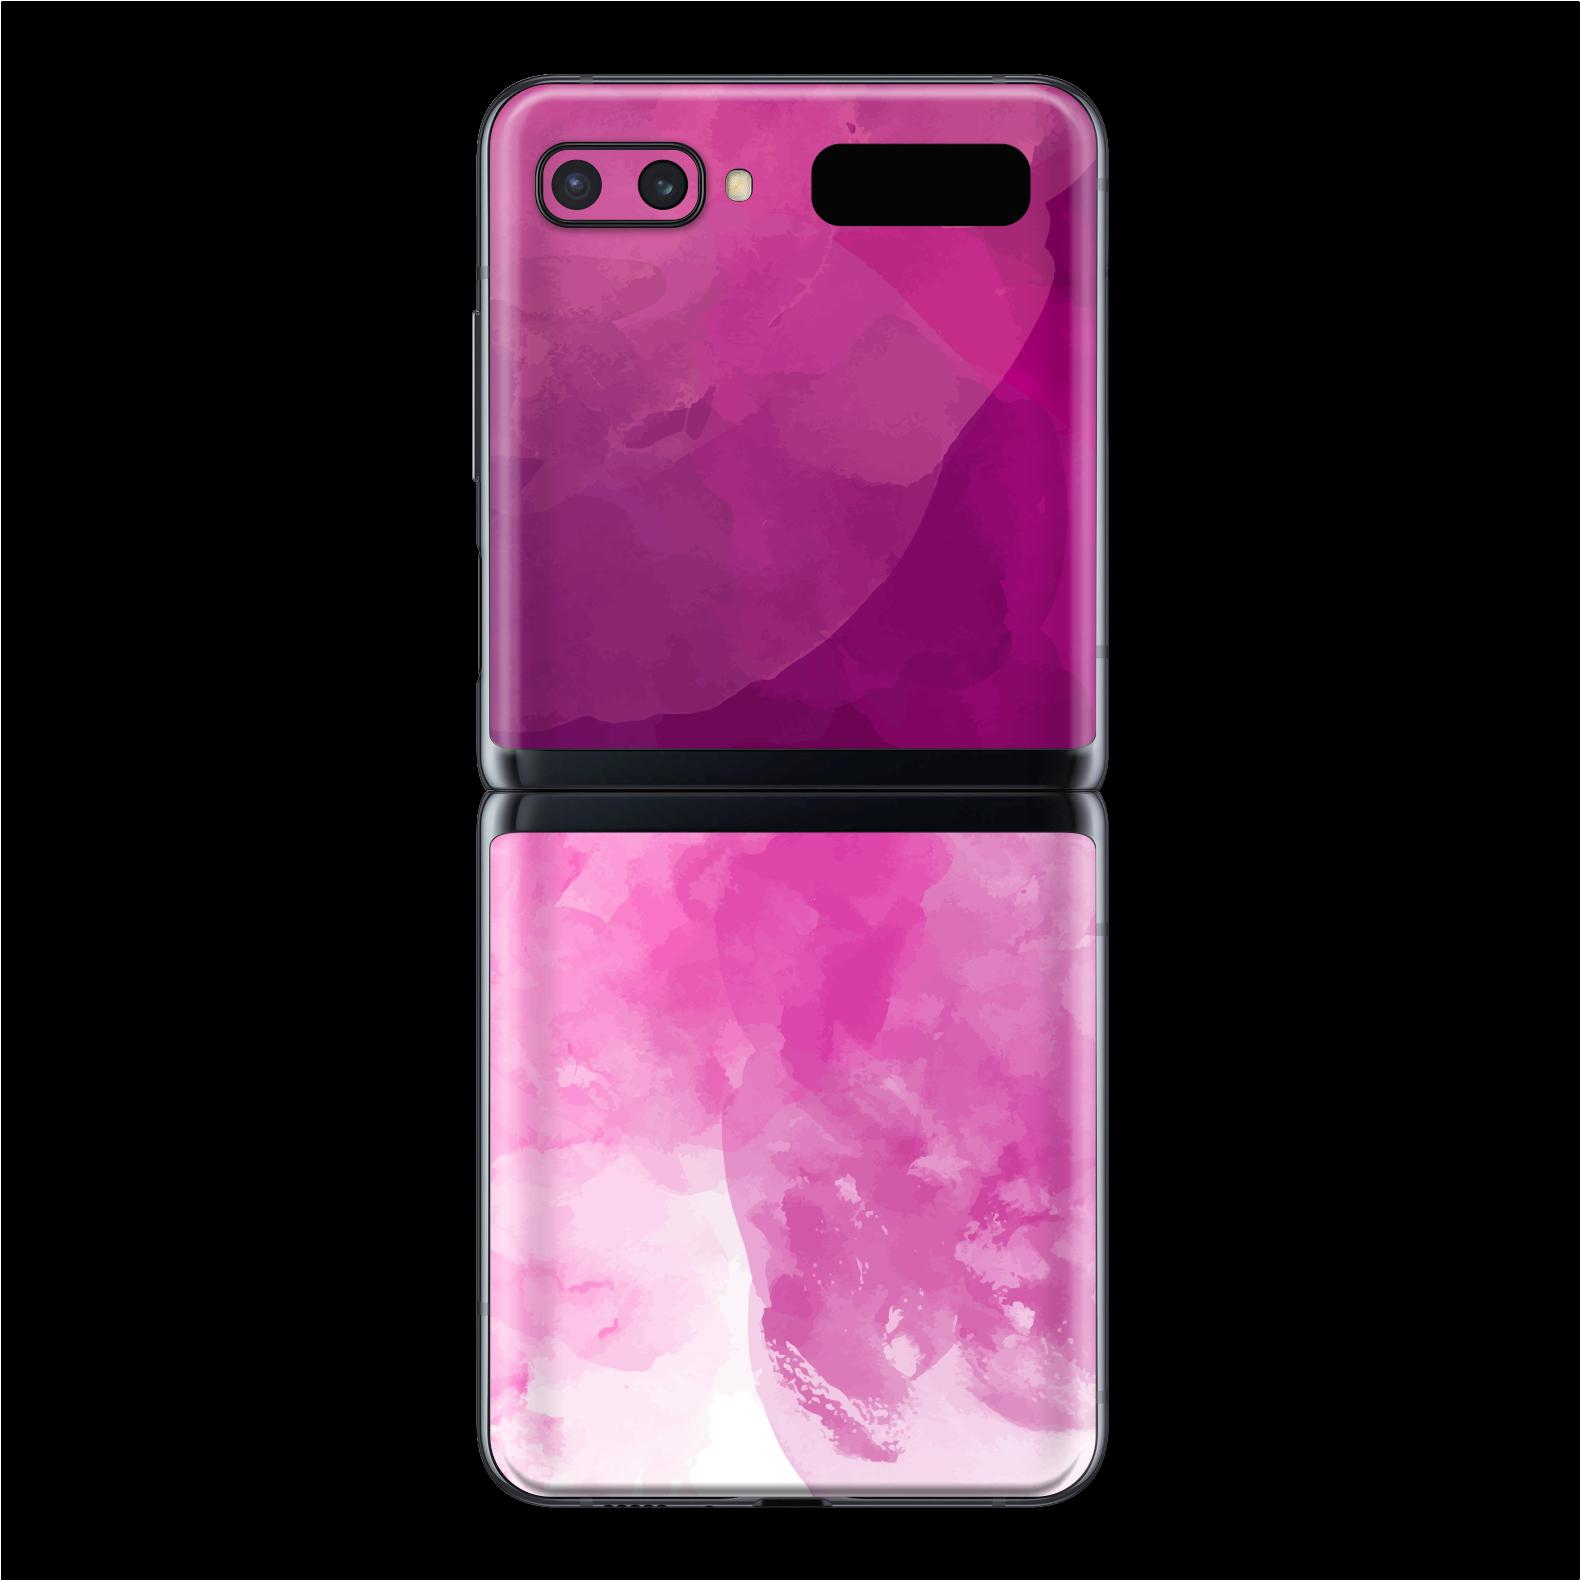 Samsung Galaxy Z Flip SIGNATURE Magenta Watercolour Skin